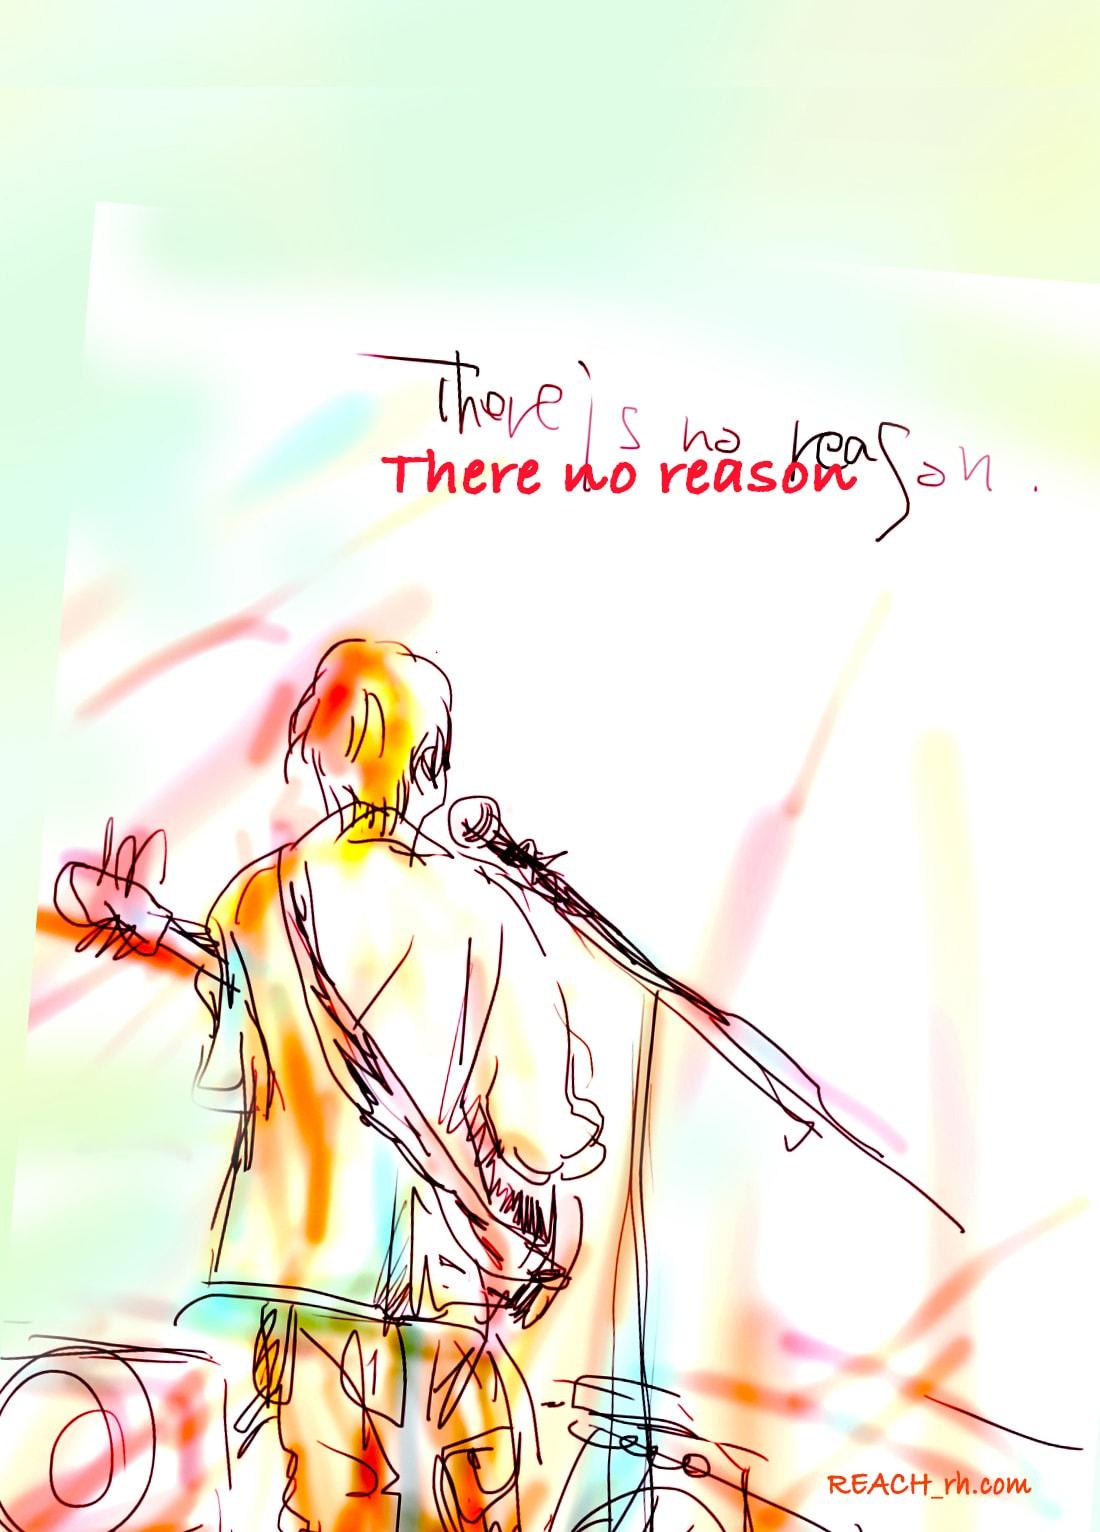 NO REASON07_2